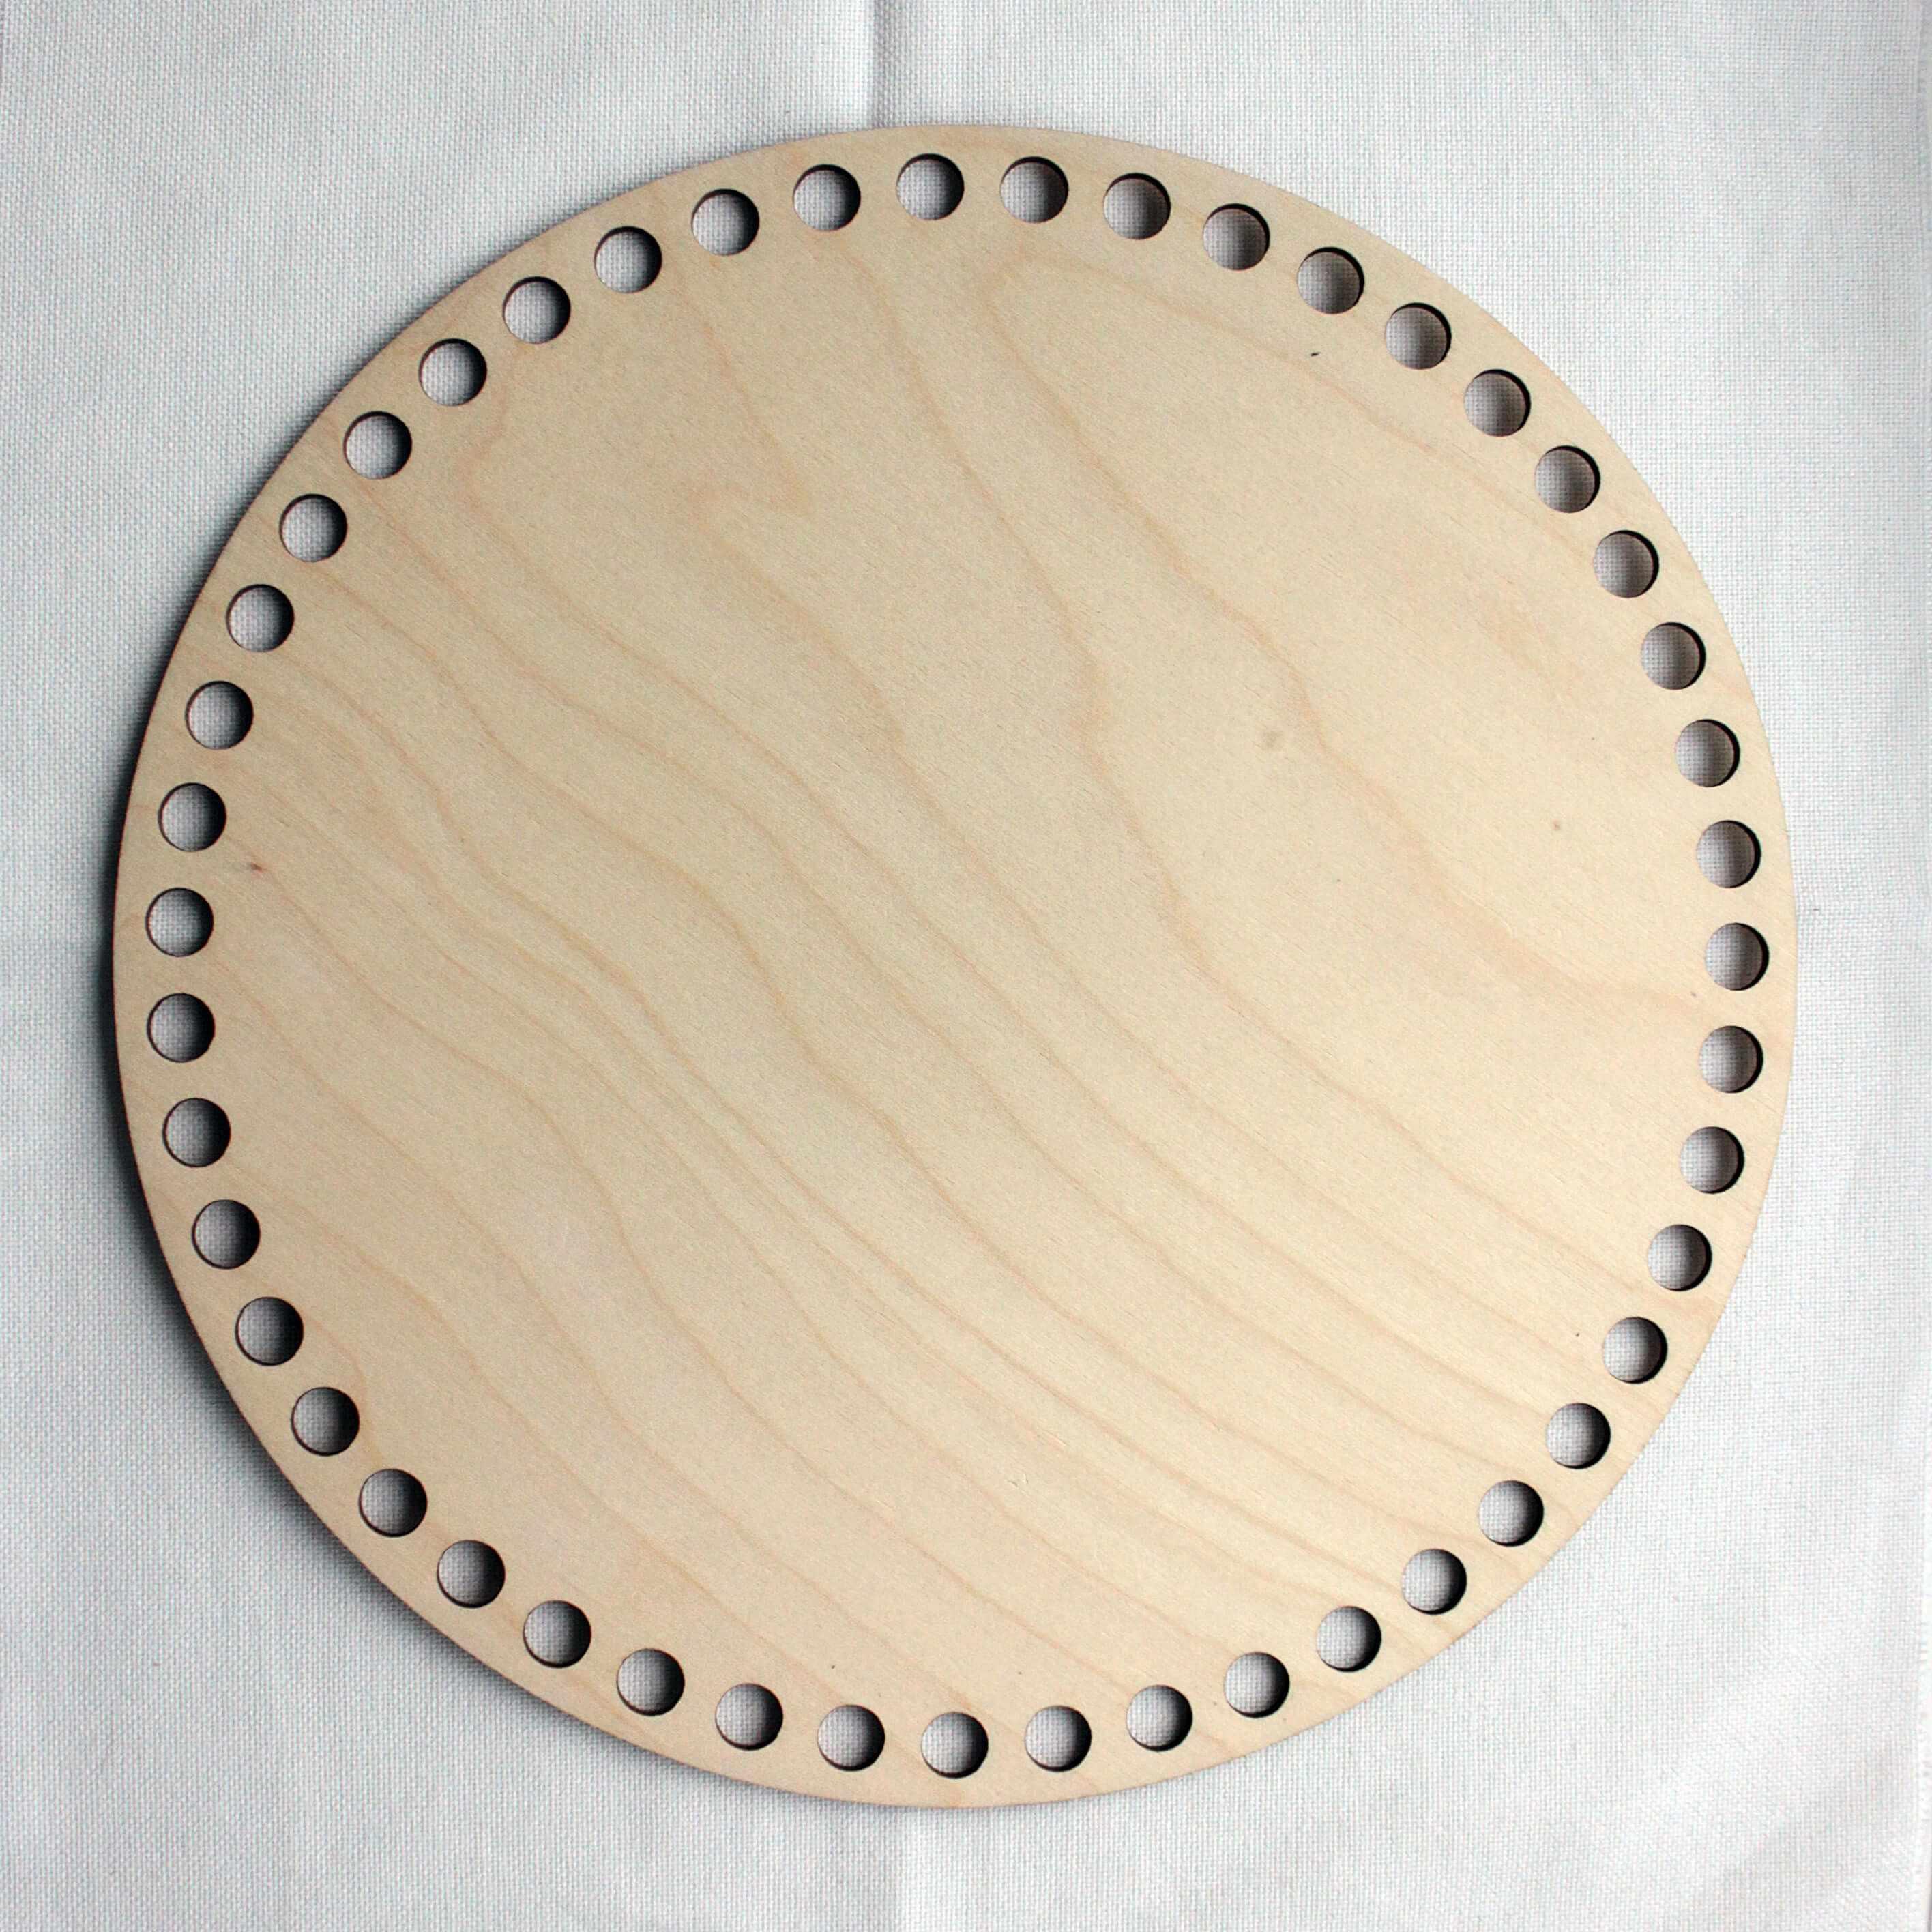 Основа для корзины, круг d150